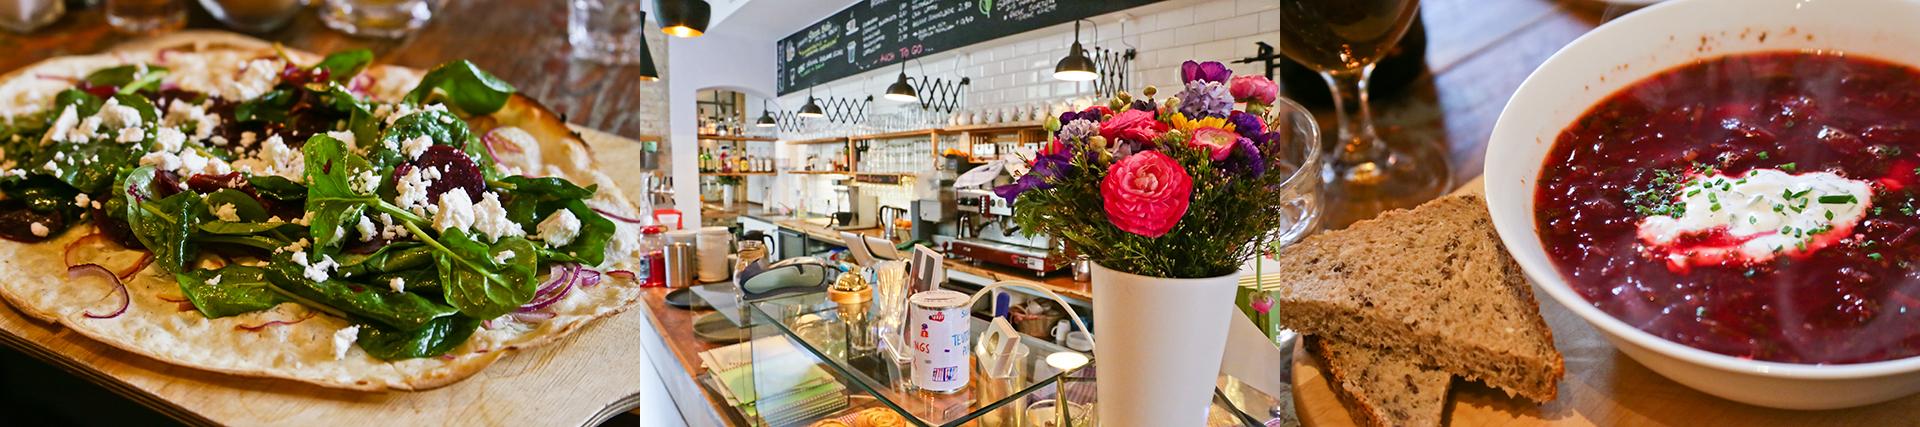 Cafe Krone 2